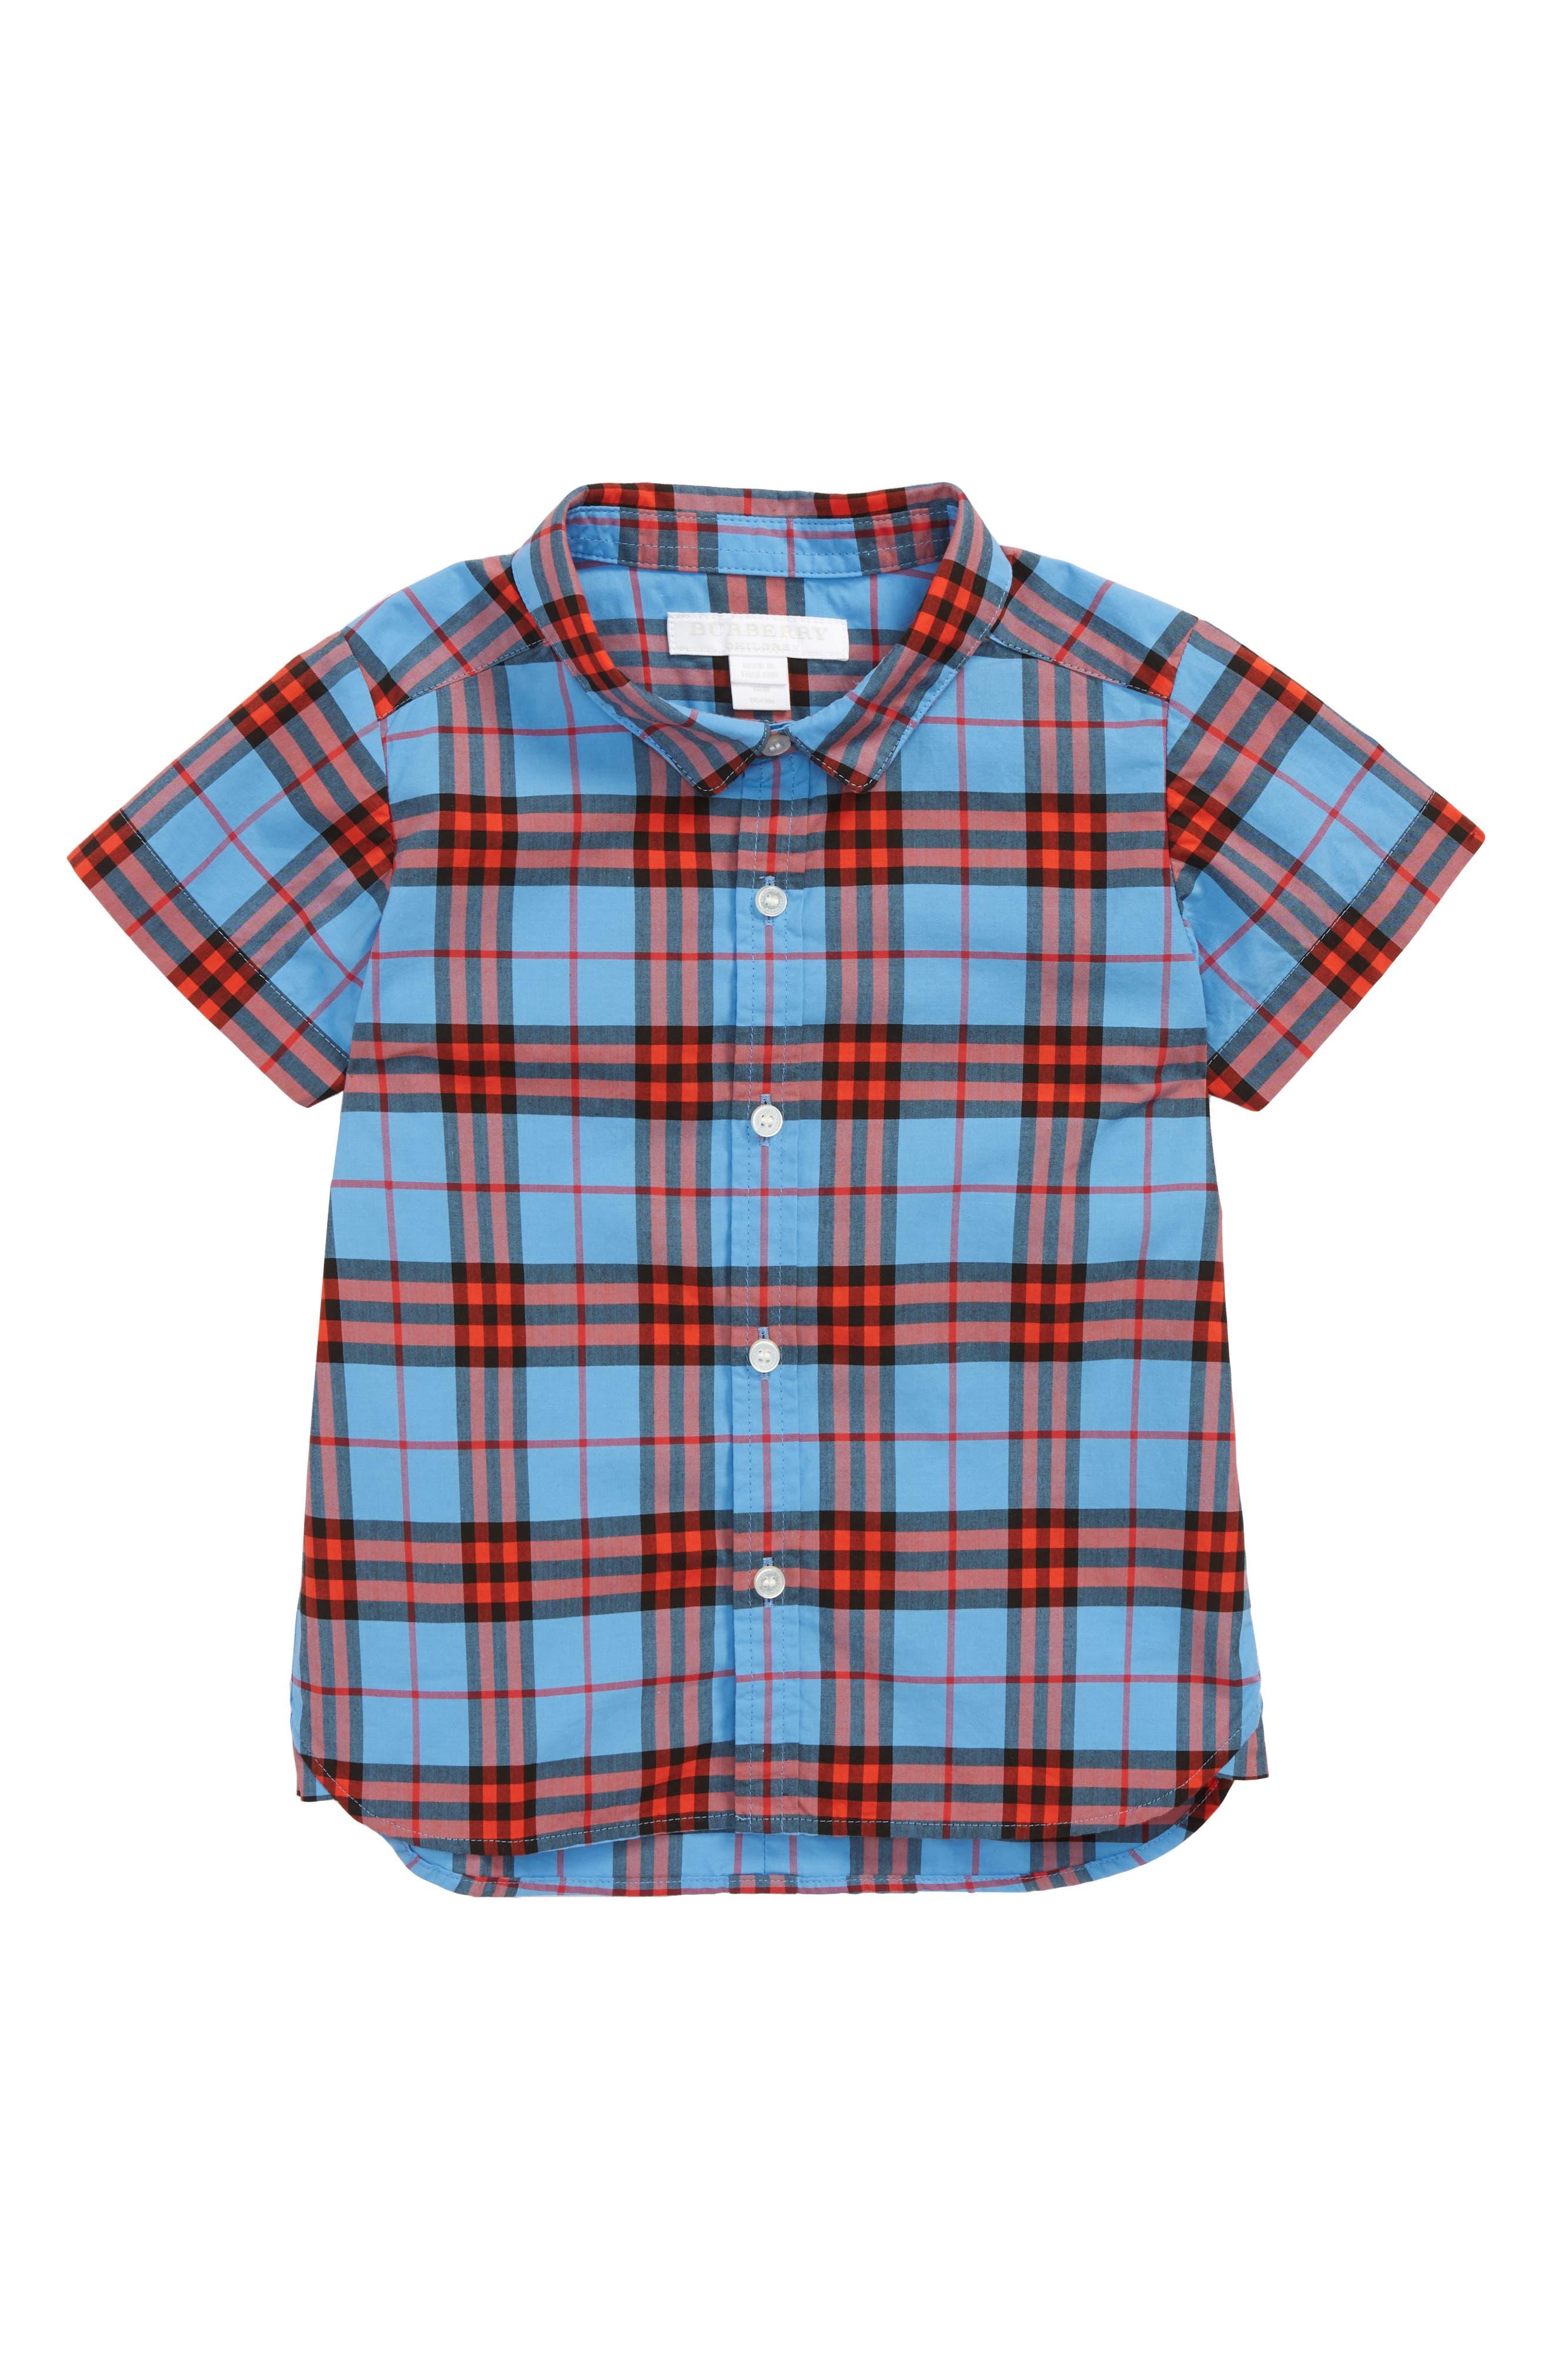 Clarkey Plaid Woven Shirt,                         Main,                         color, CORNFLOWER BLUE